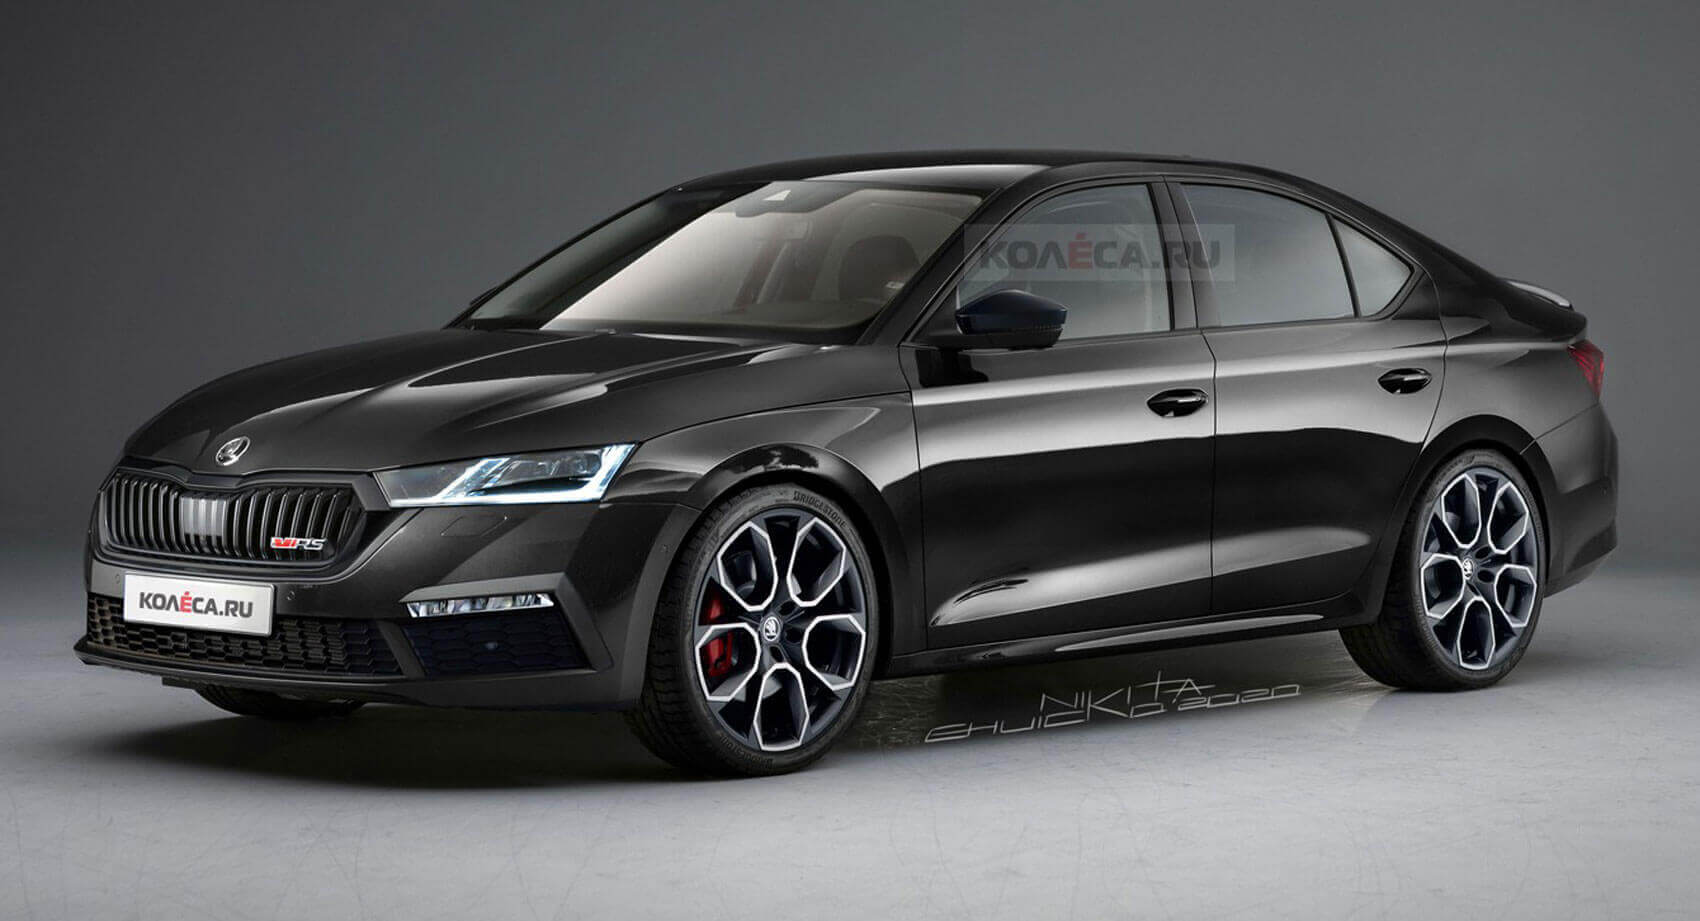 2021 Skoda Superb Concept